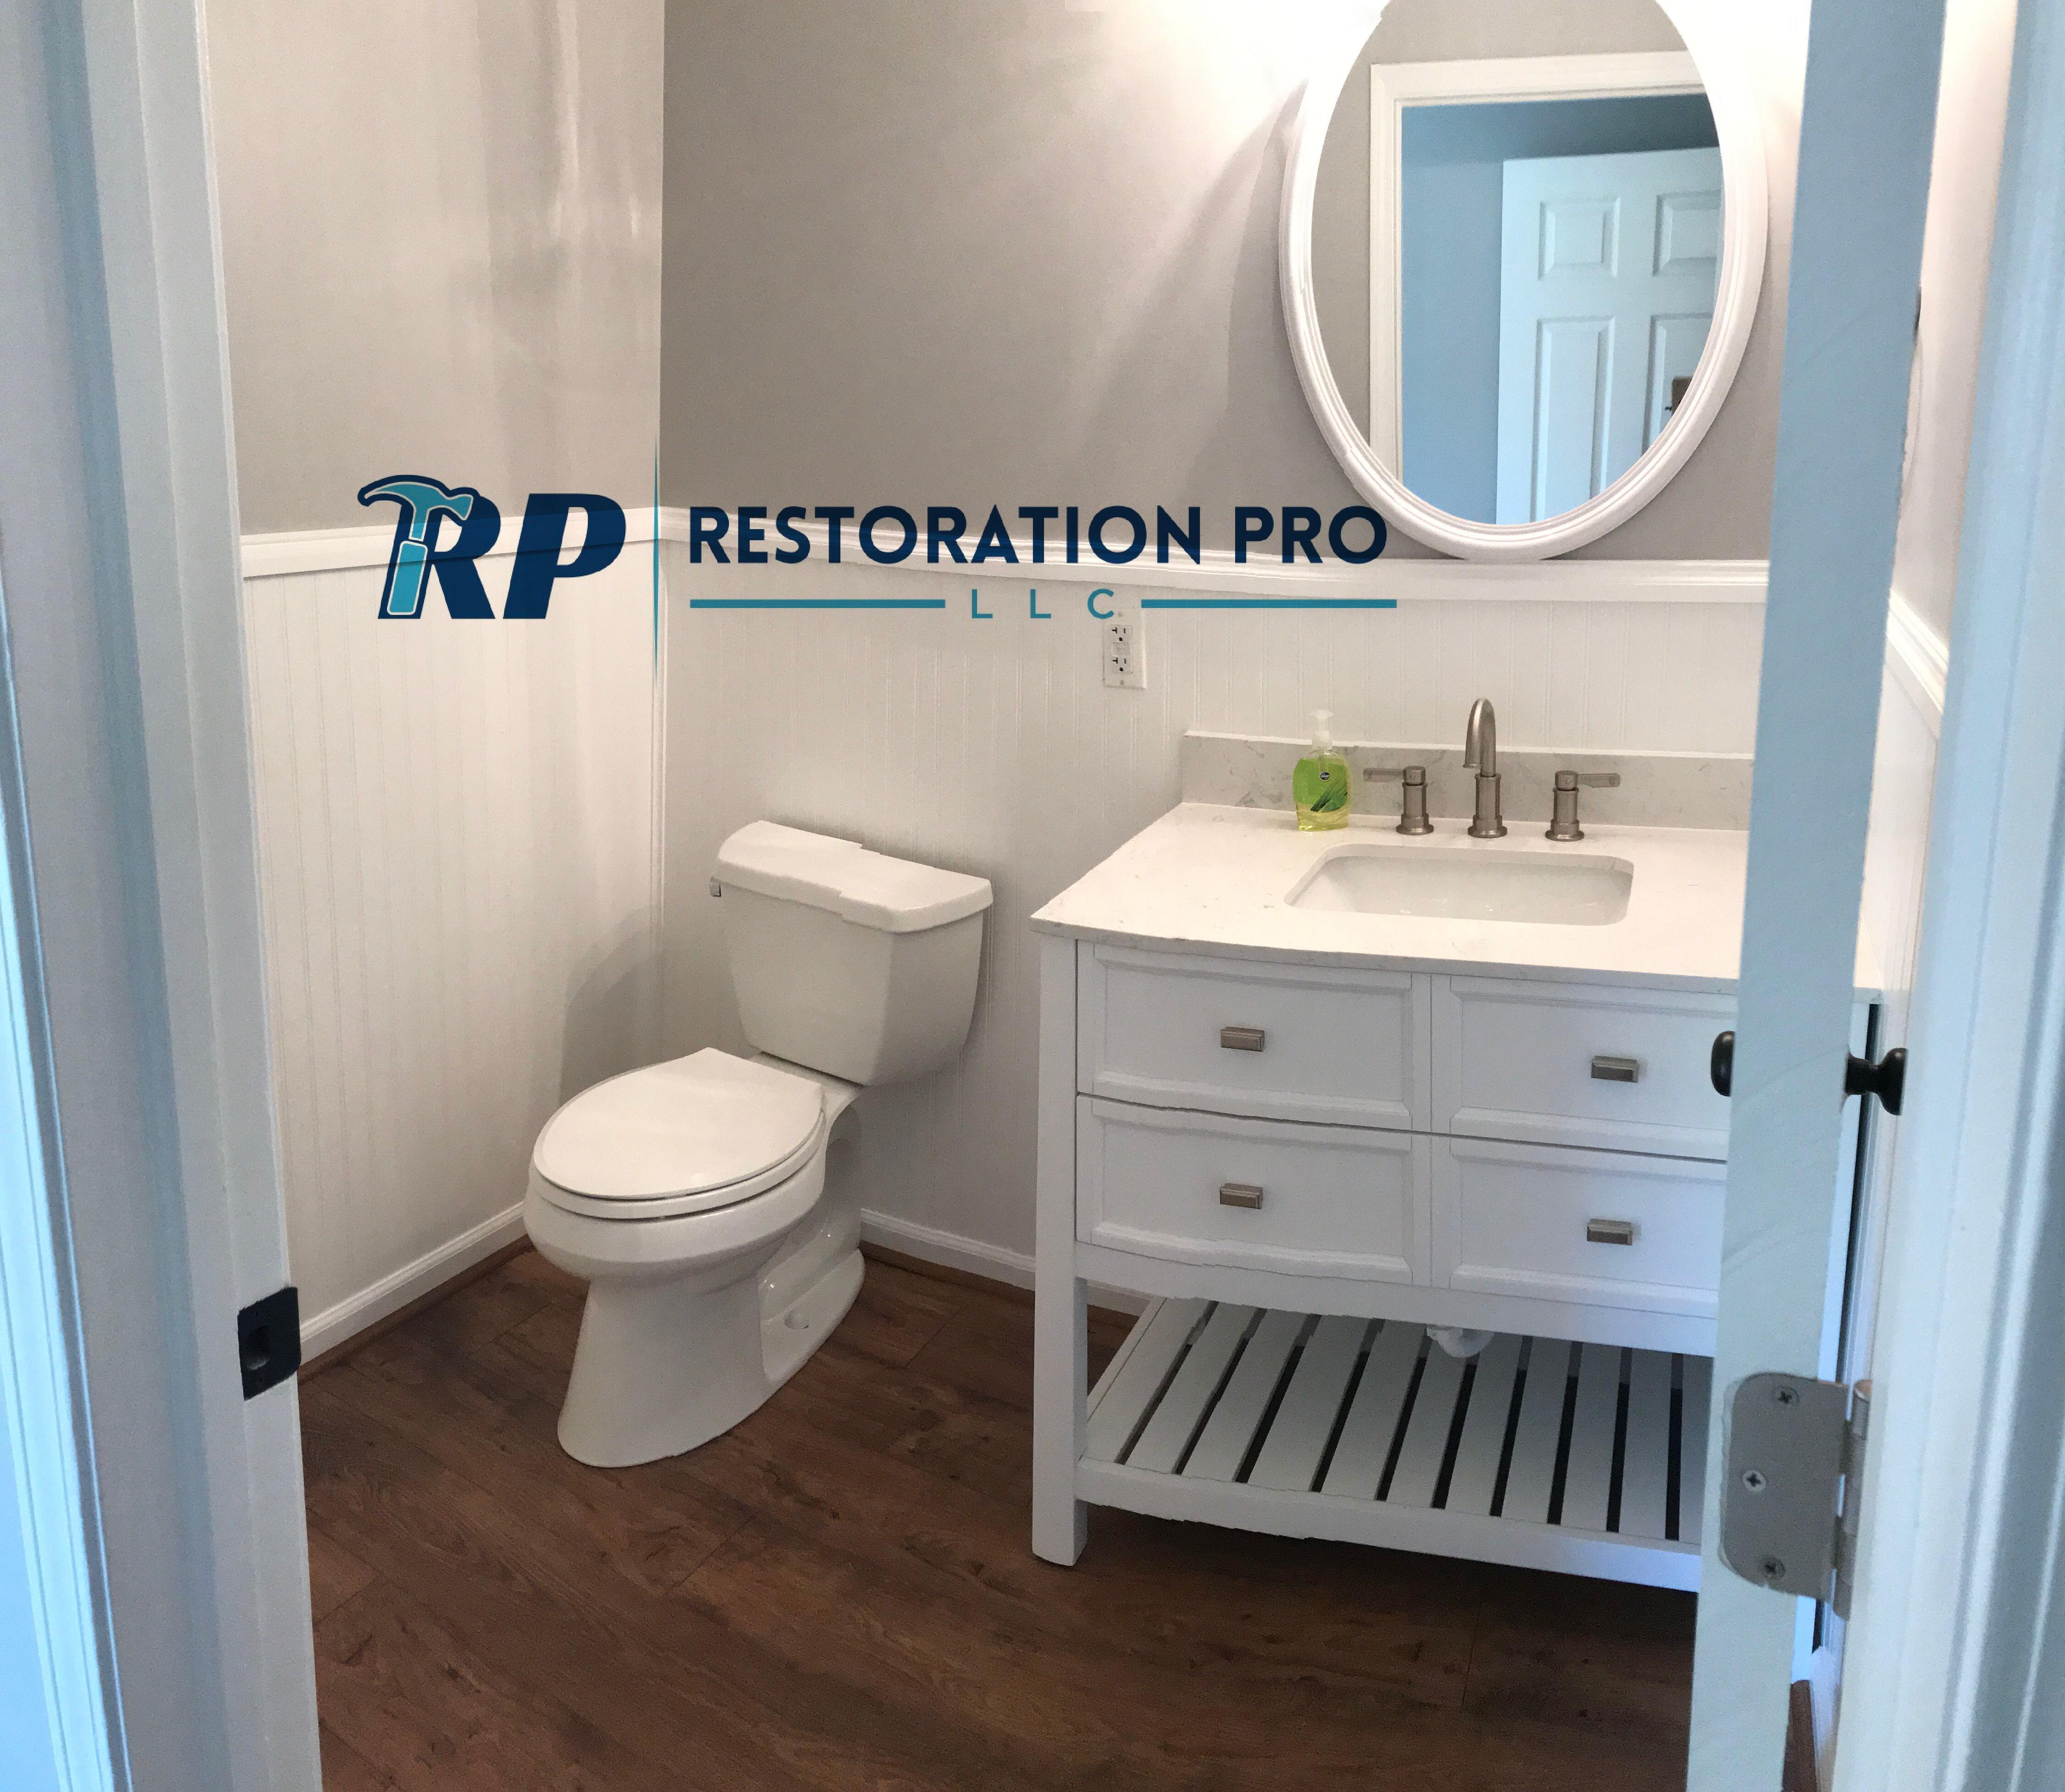 Restoration Pro LLC image 15